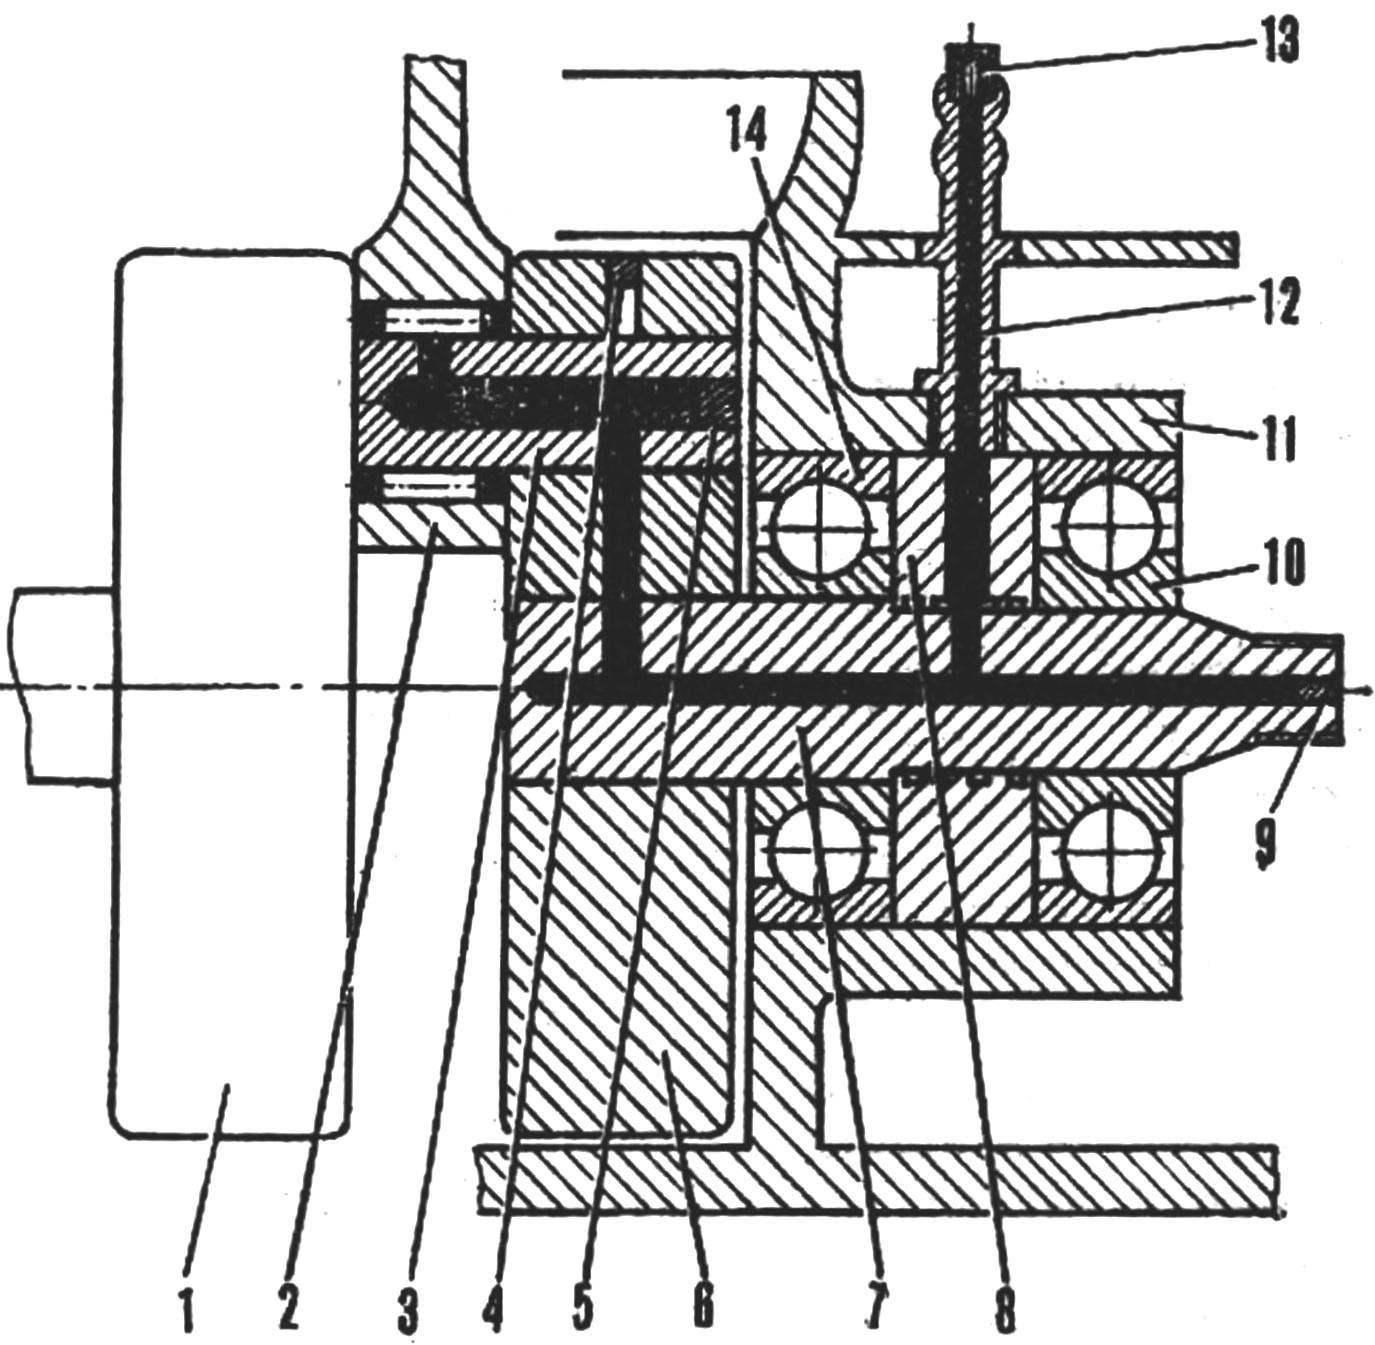 Схема модернизированного шатунно-кривошипного узла